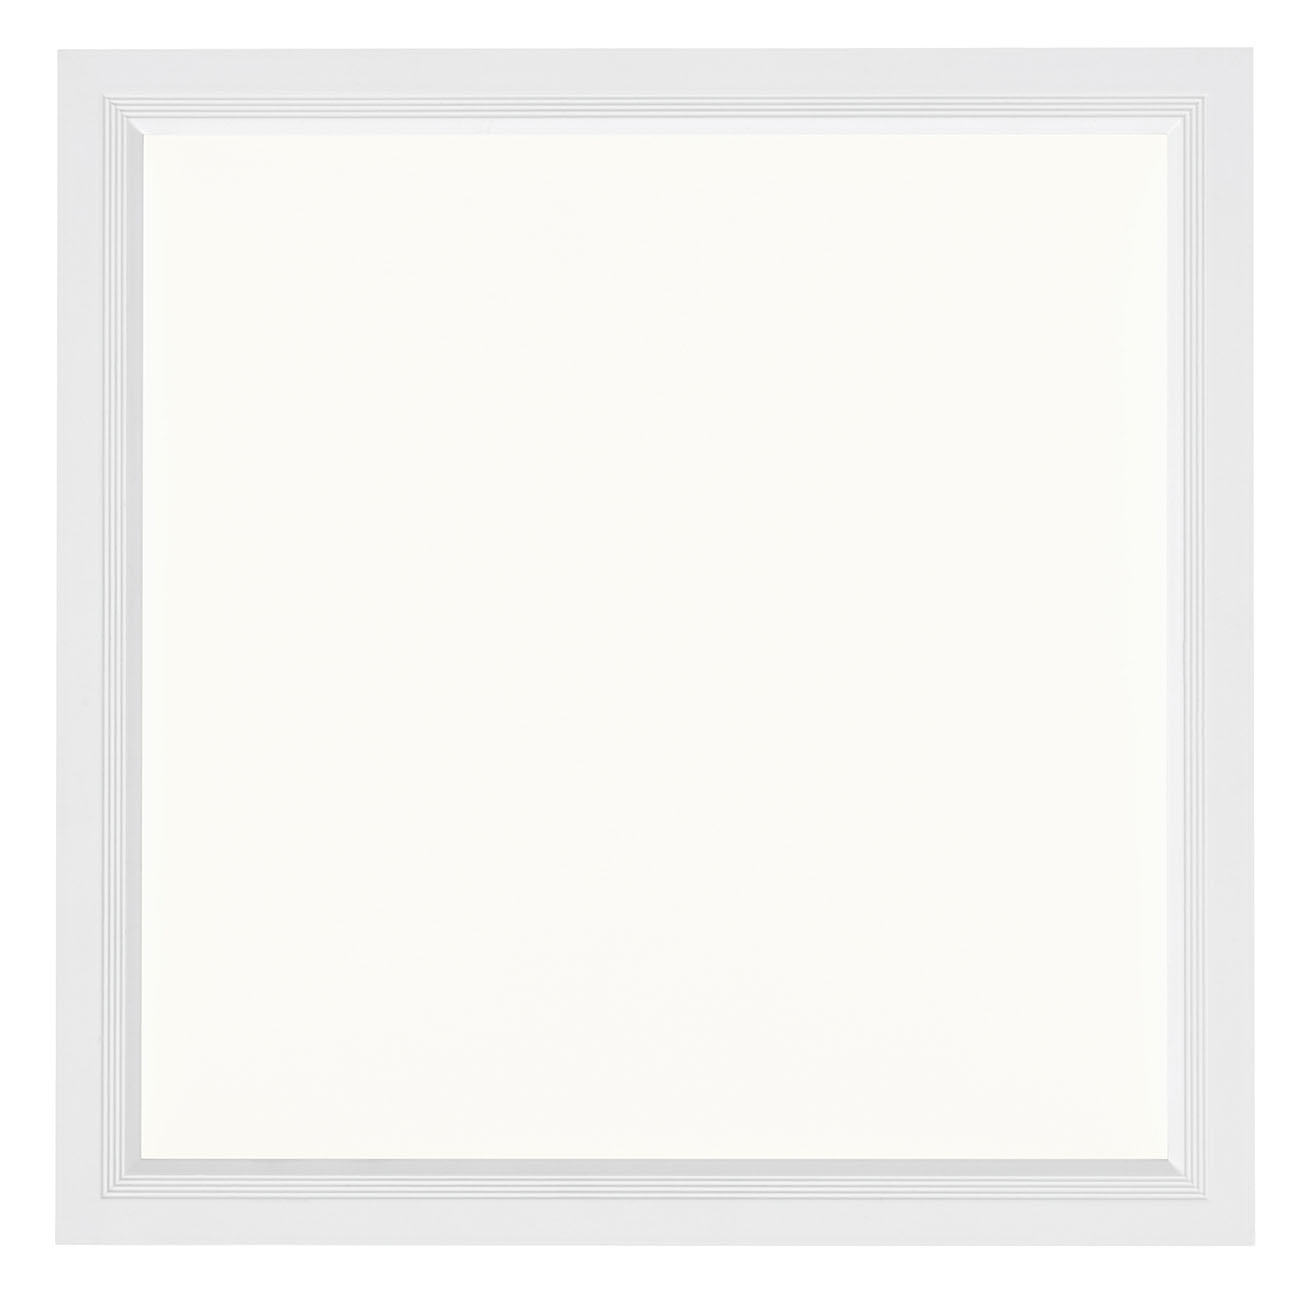 TELEFUNKEN RGB LED Panel, 29,5 cm, 18 W, Weiss